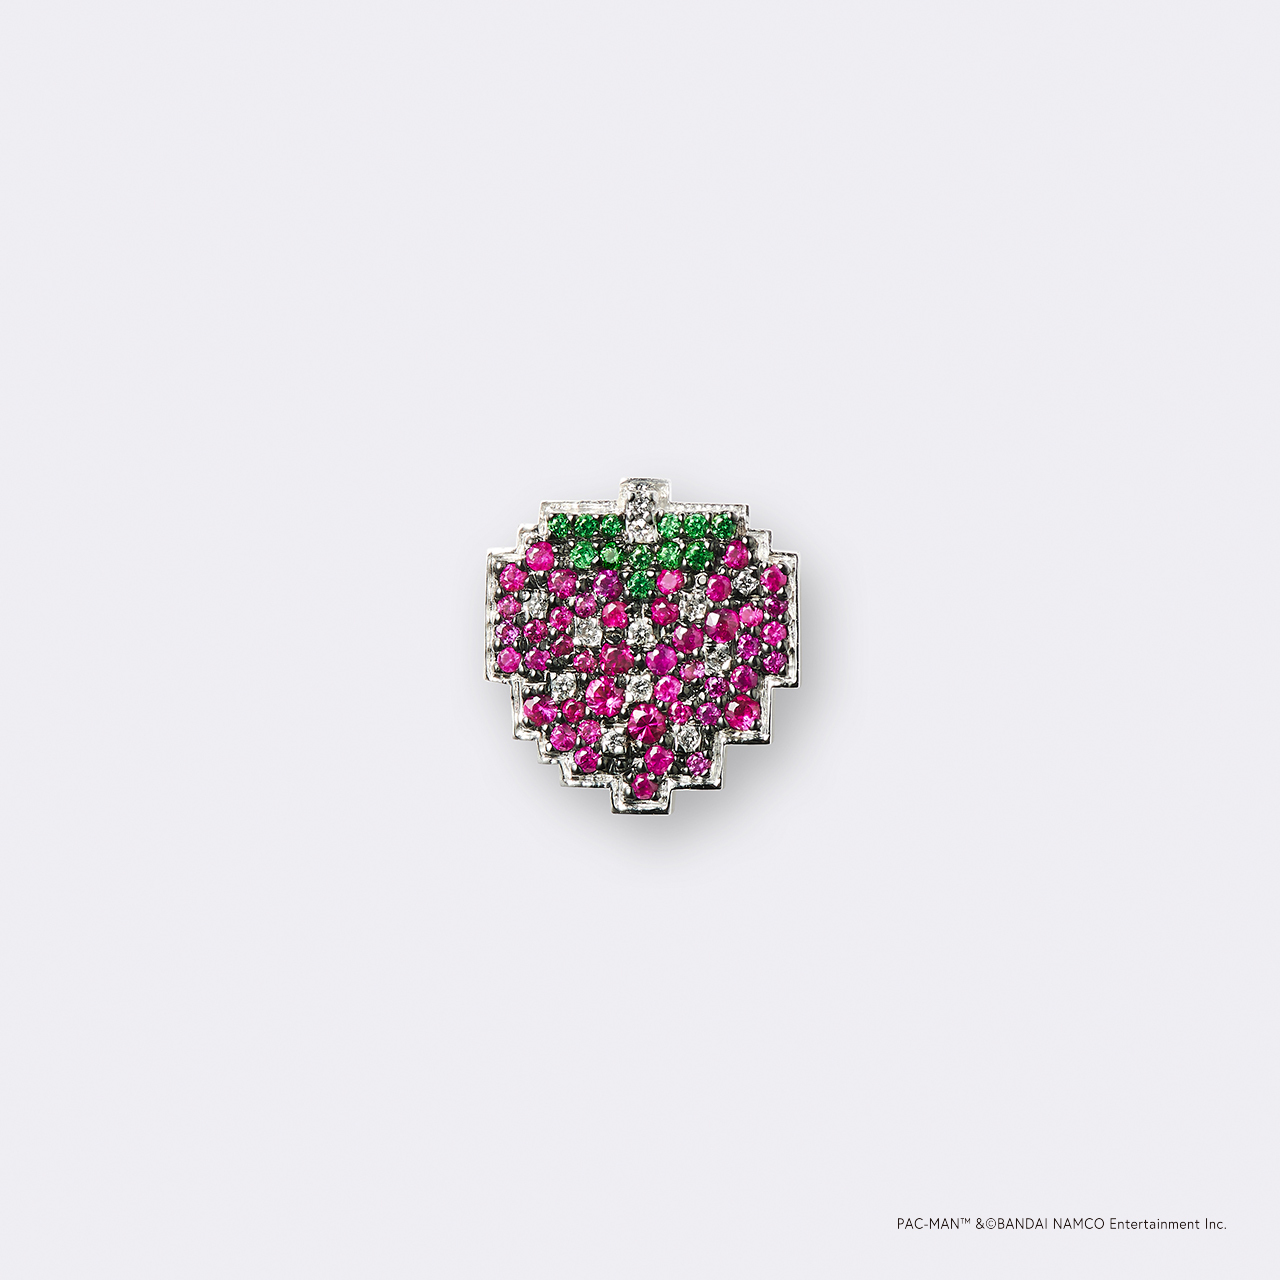 PAC-MAN  (パックマン) K18WG・ボーナスフルーツ ストロベリー/グリーンガーネット ルビー ダイヤモンドピンバッジ